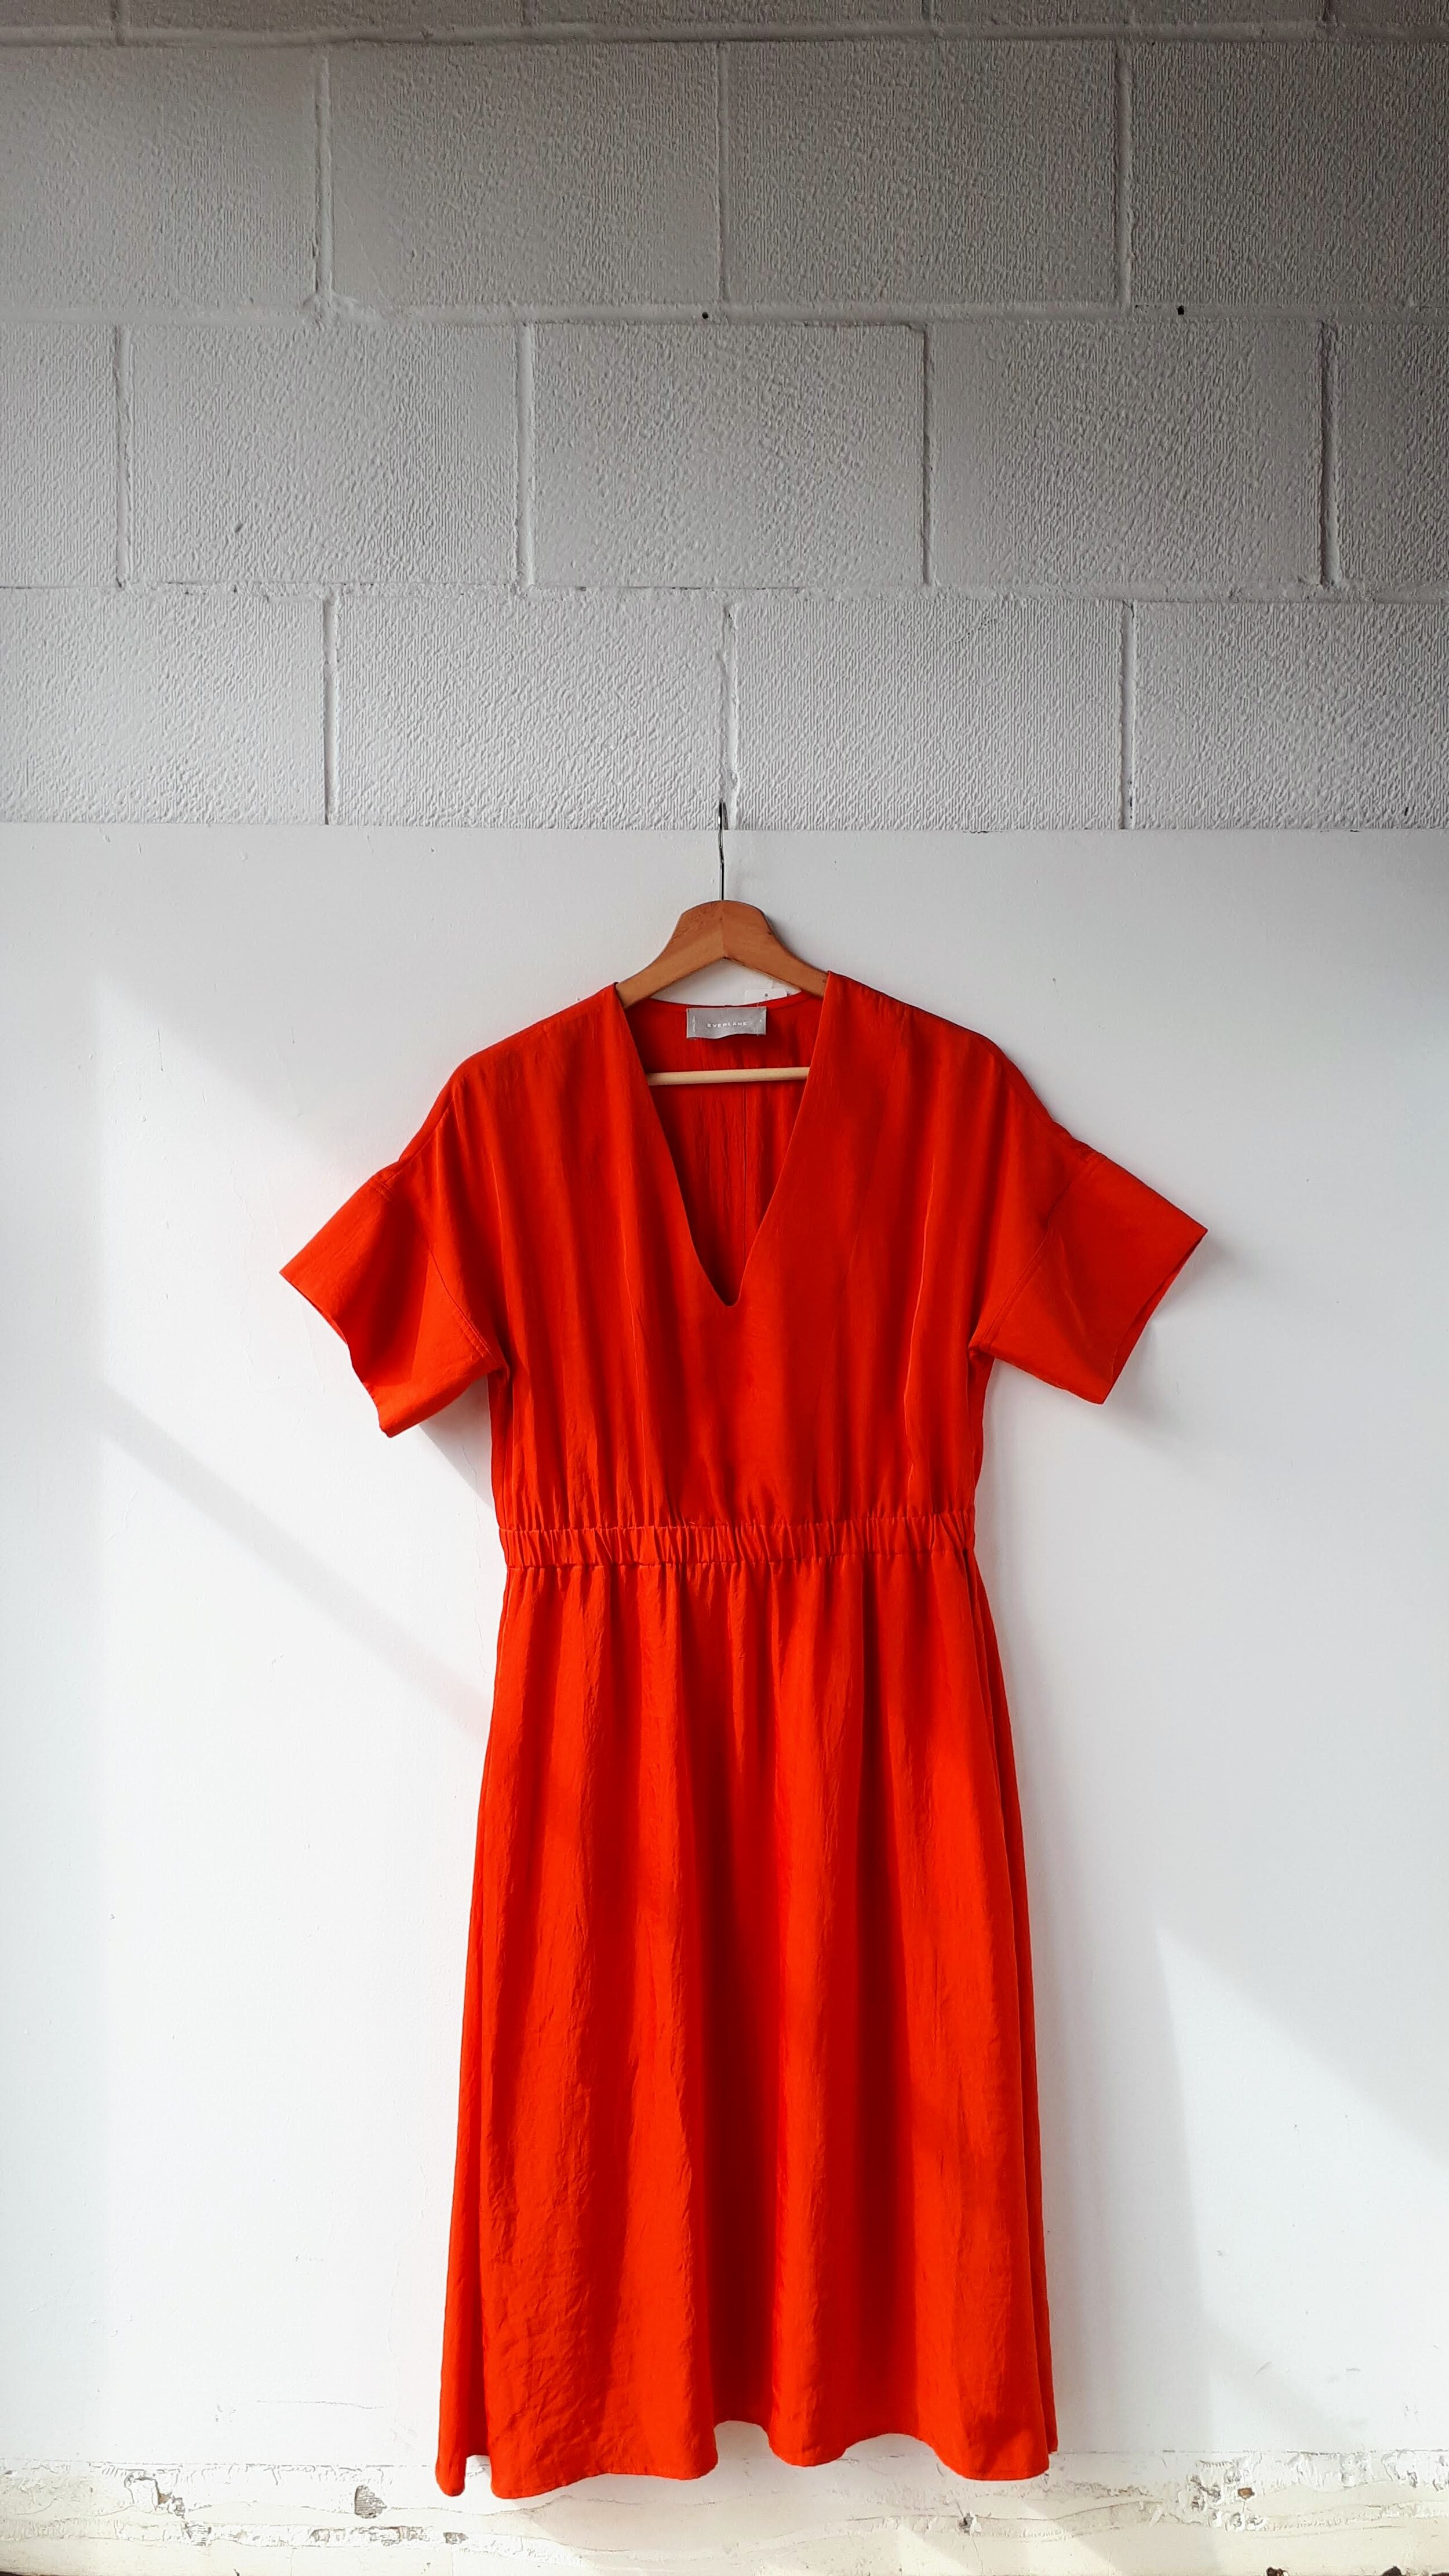 Everlane dress; Size 8, $38